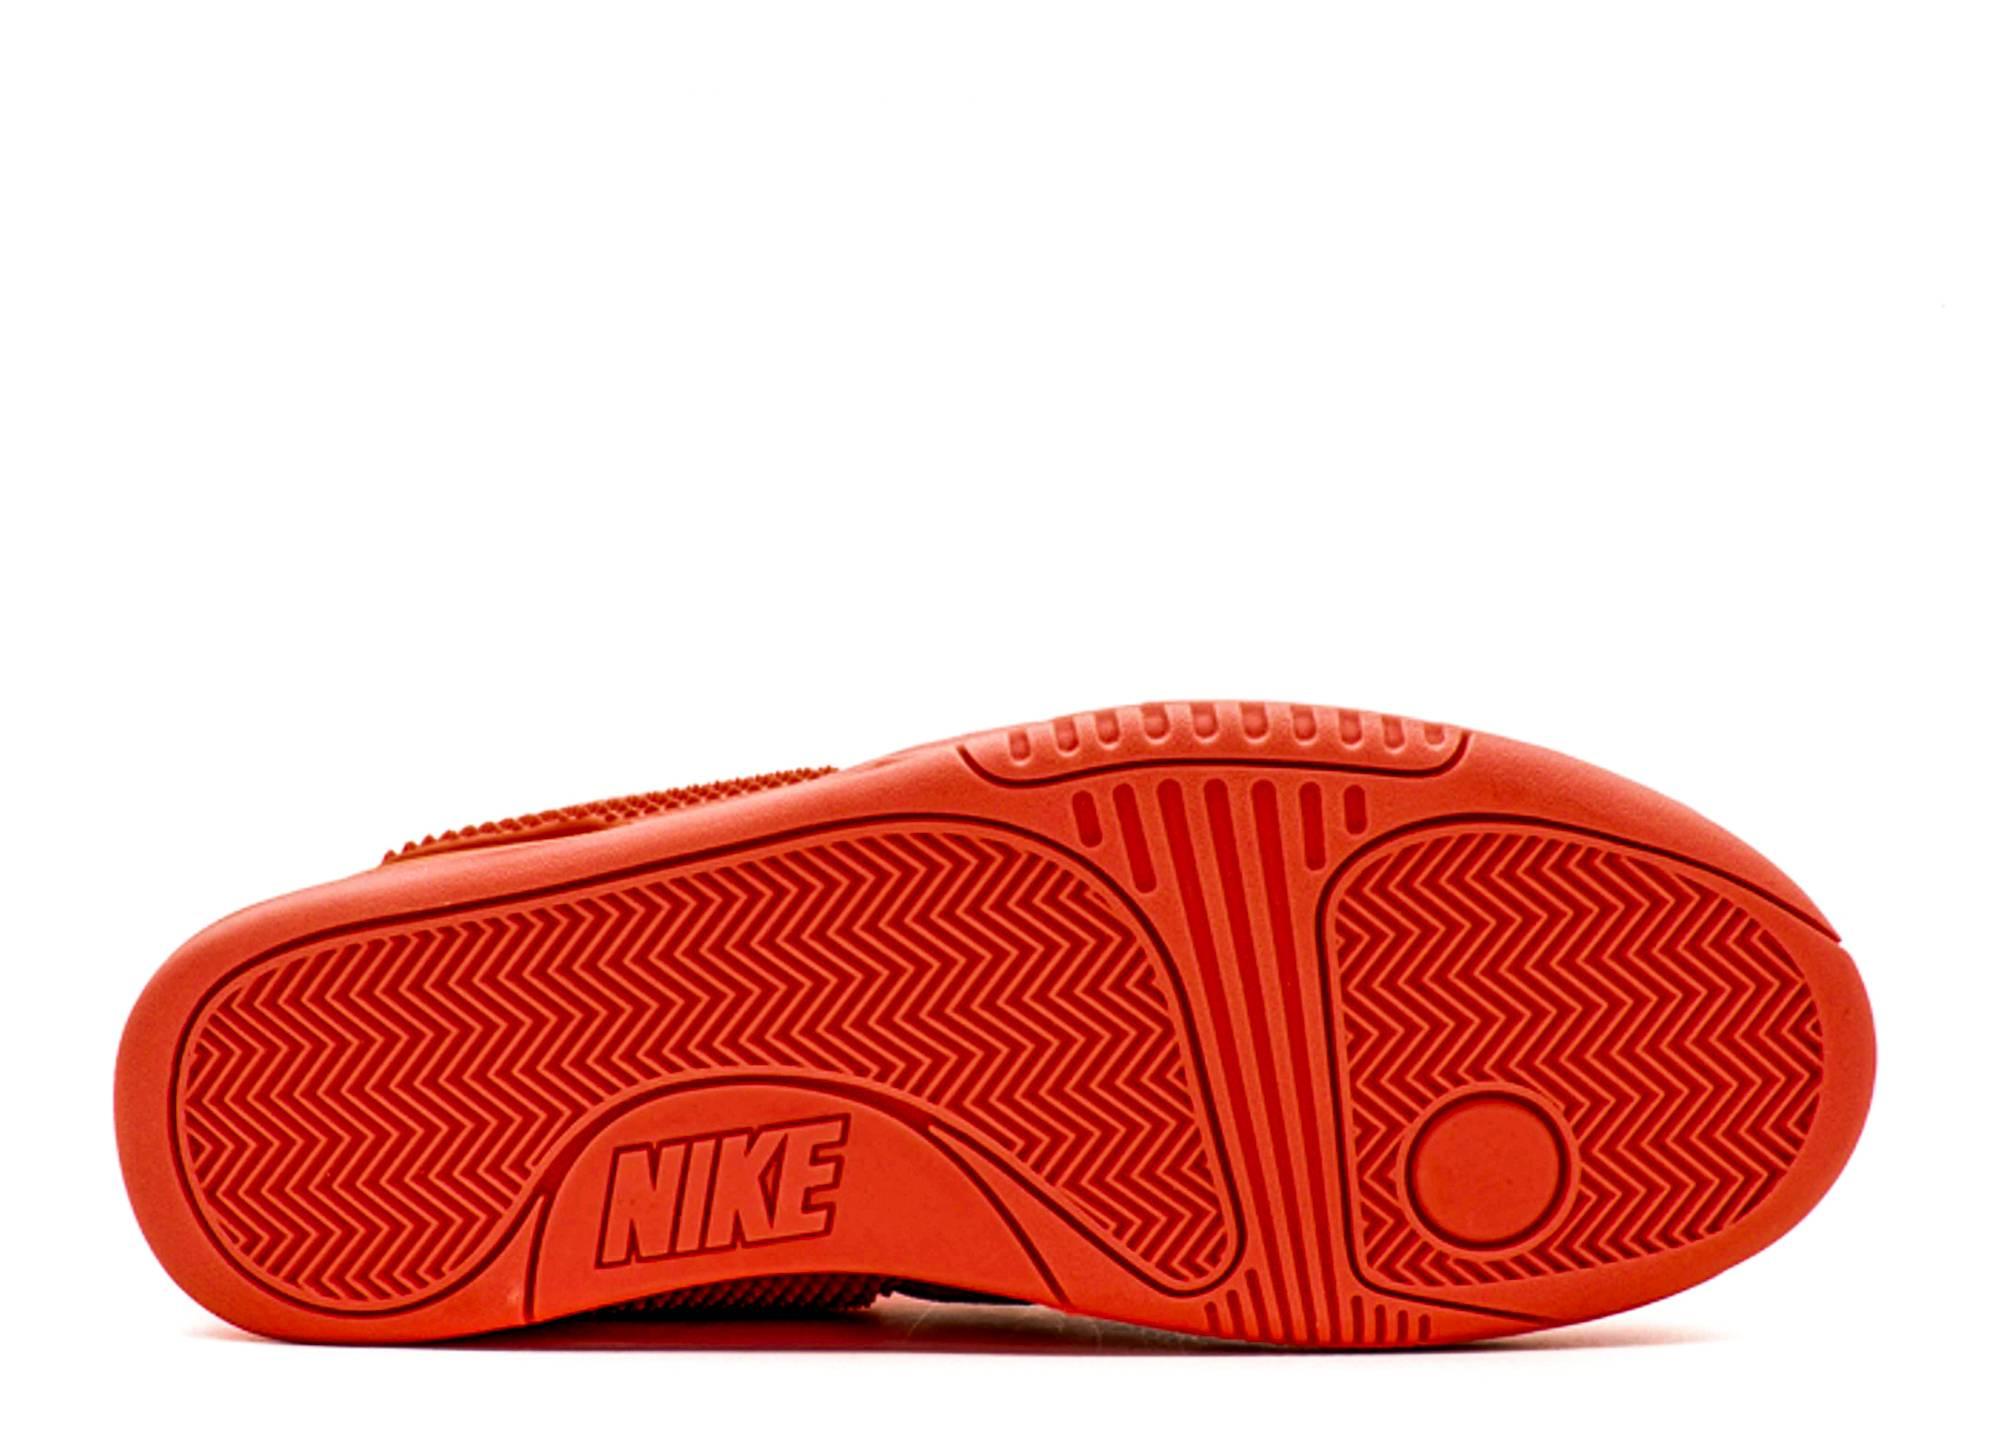 gato conjunto Australia  Air Yeezy 2 Sp 'red October' - Nike - 508214 660 - red | Flight Club